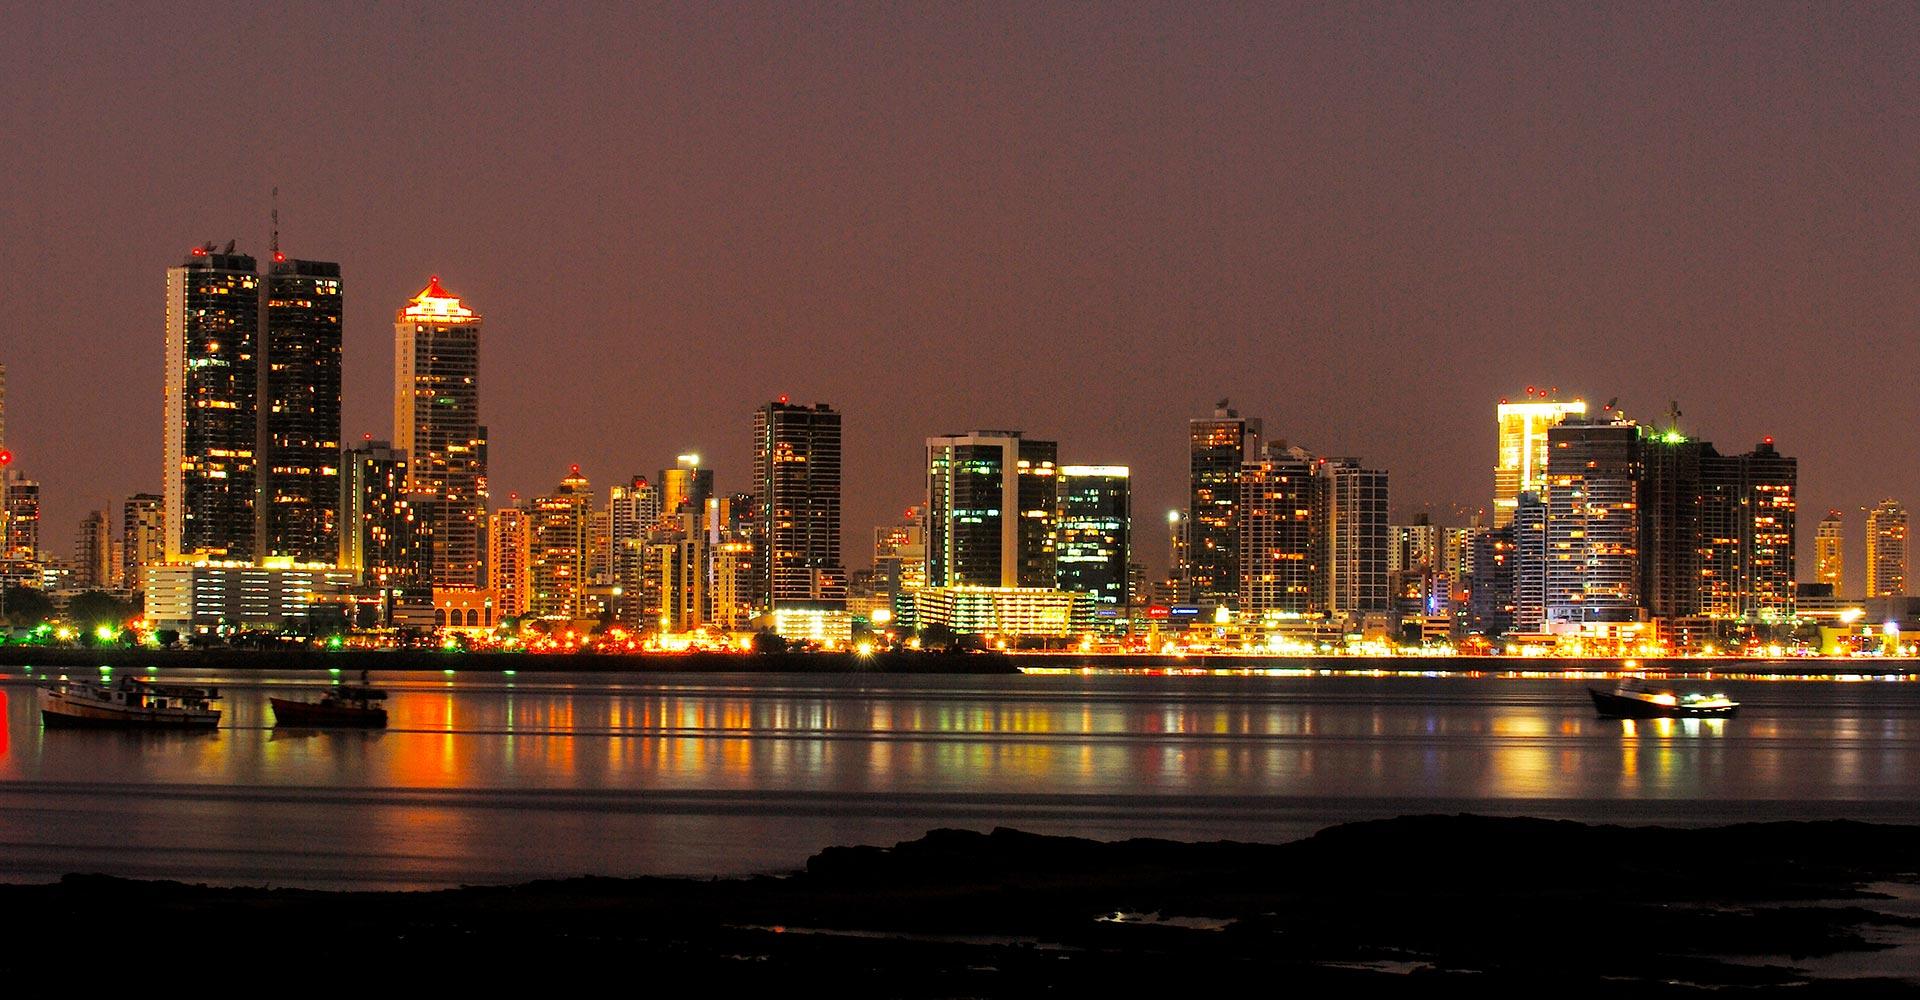 Panama_Panama City_Skyline bei Nacht_Reisen